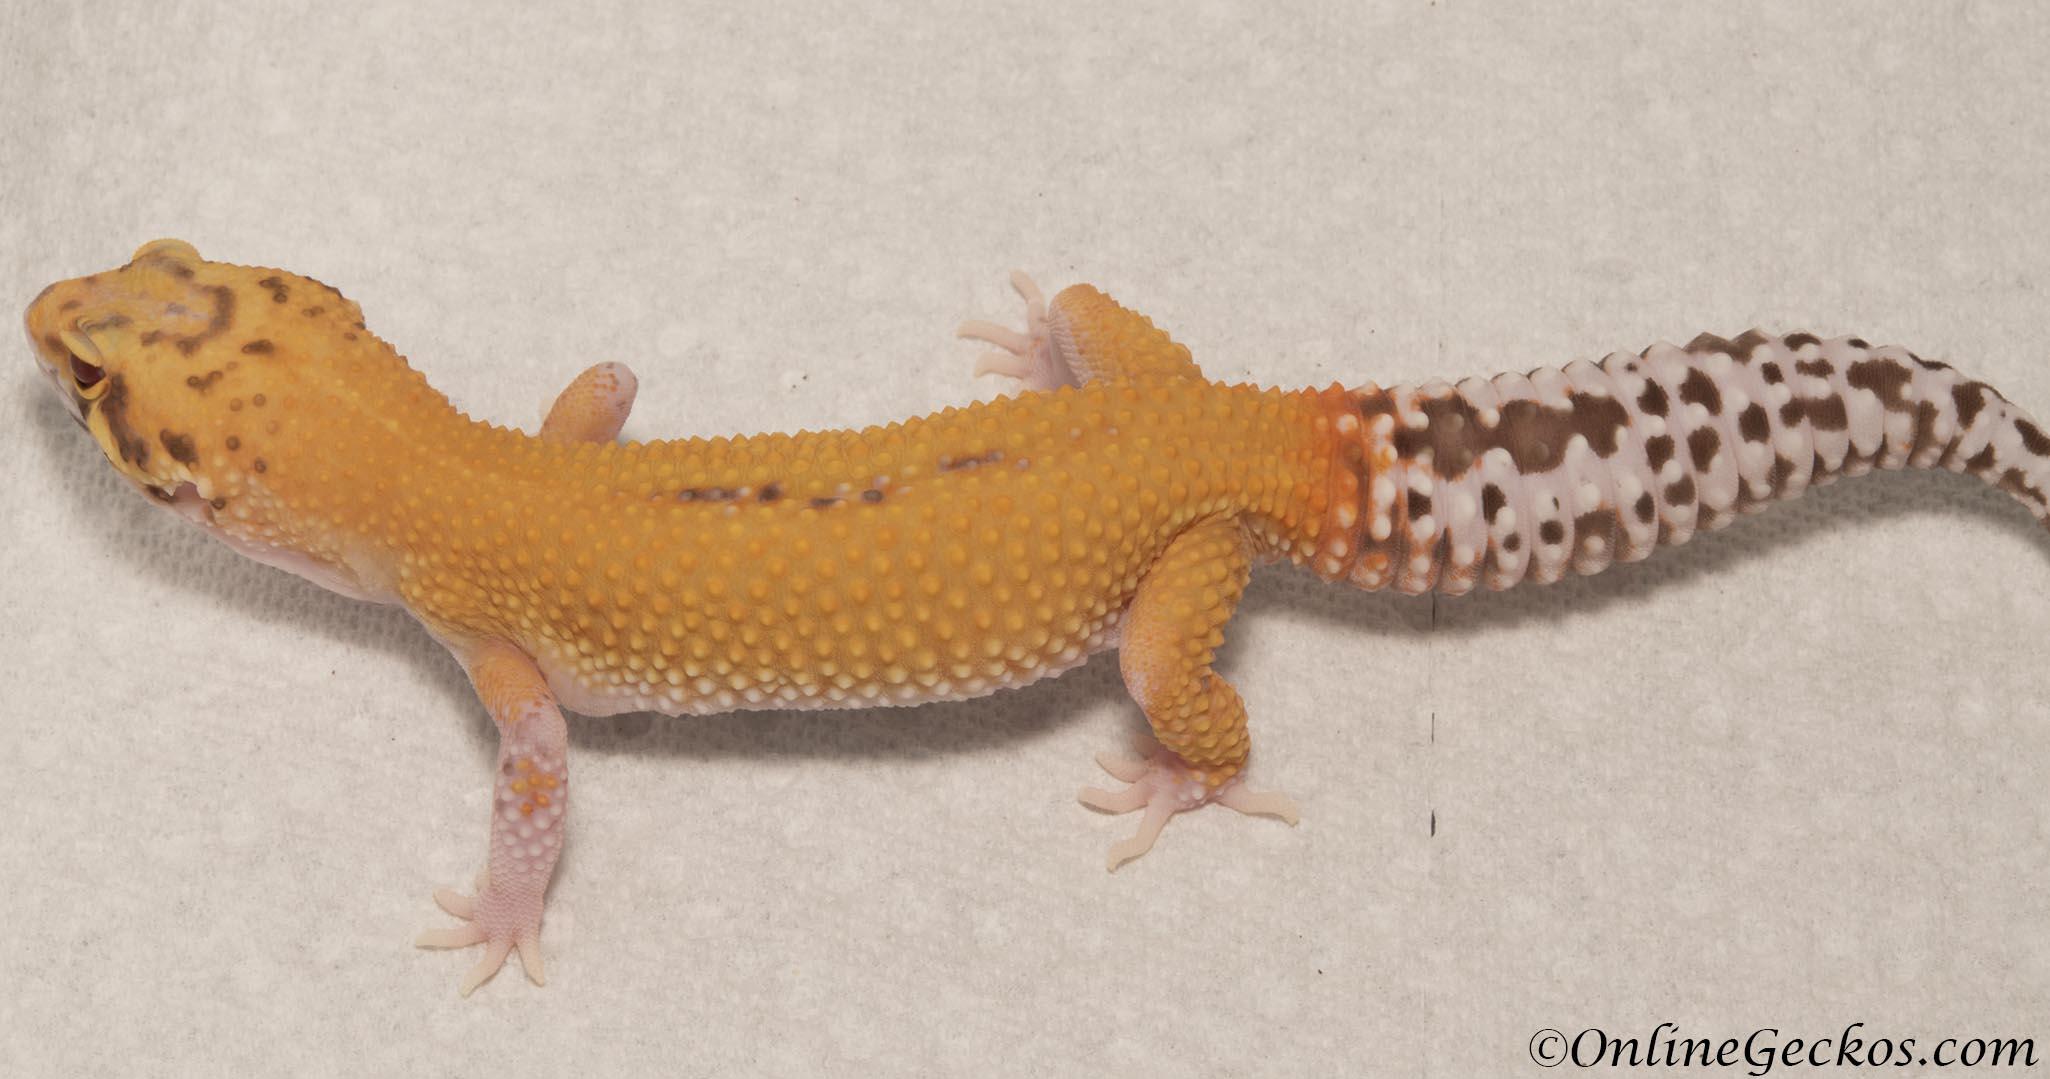 onlinegeckos-leopard-gecko-hatchling-radar-M4F53070317F ...Leopard Gecko Hatchling Care